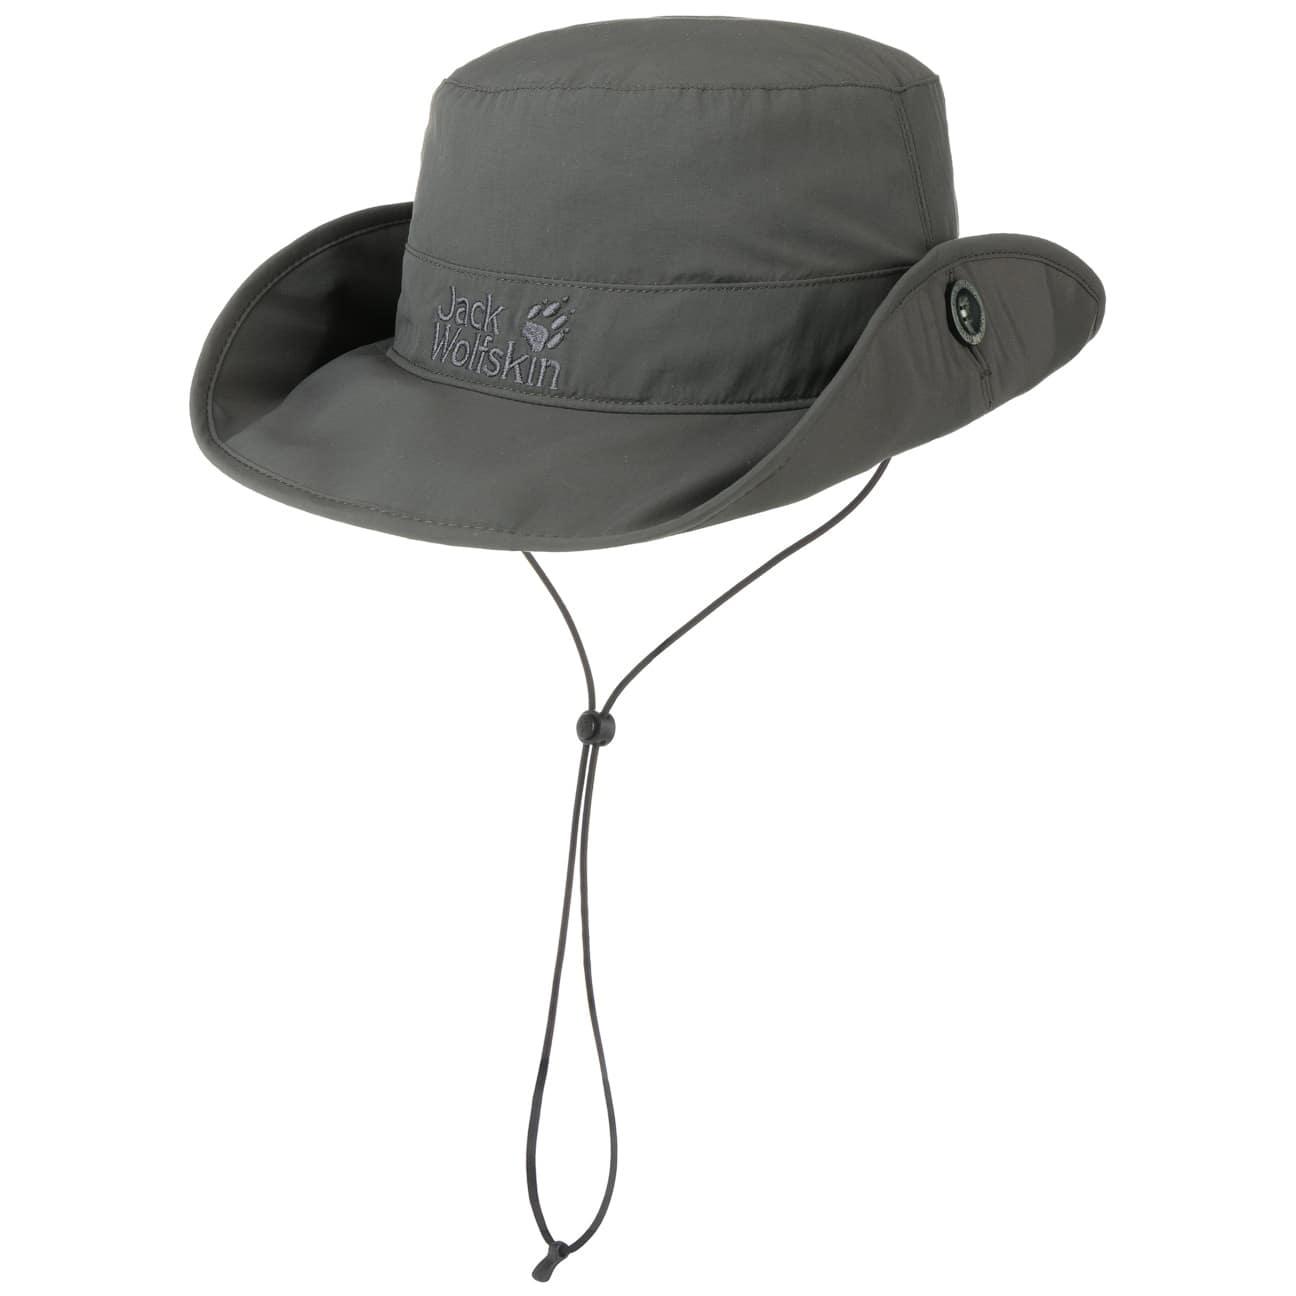 Chapeau Outdoor Supplex Mesh by Jack Wolfskin  chapeau de soleil